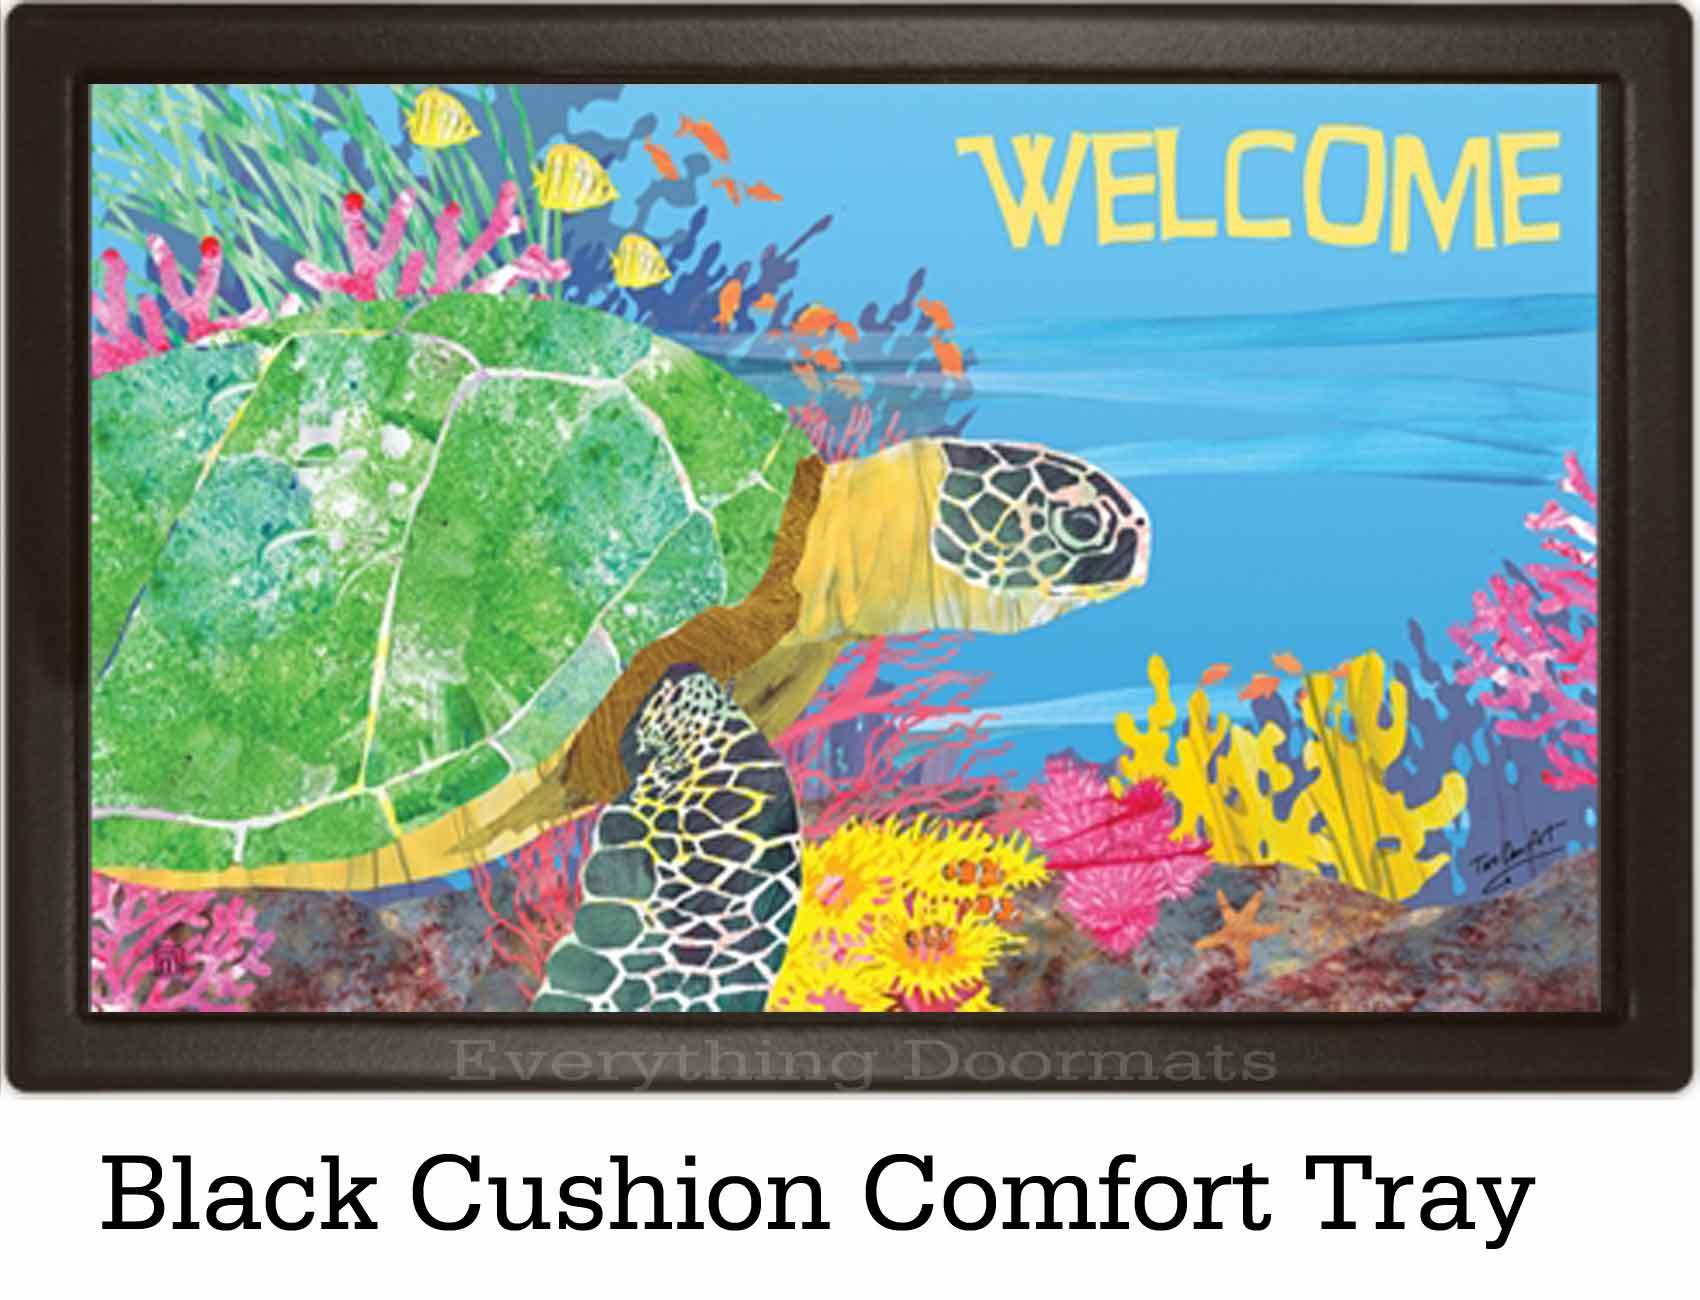 & Outdoor By the Sea Turtle MatMates Doormat